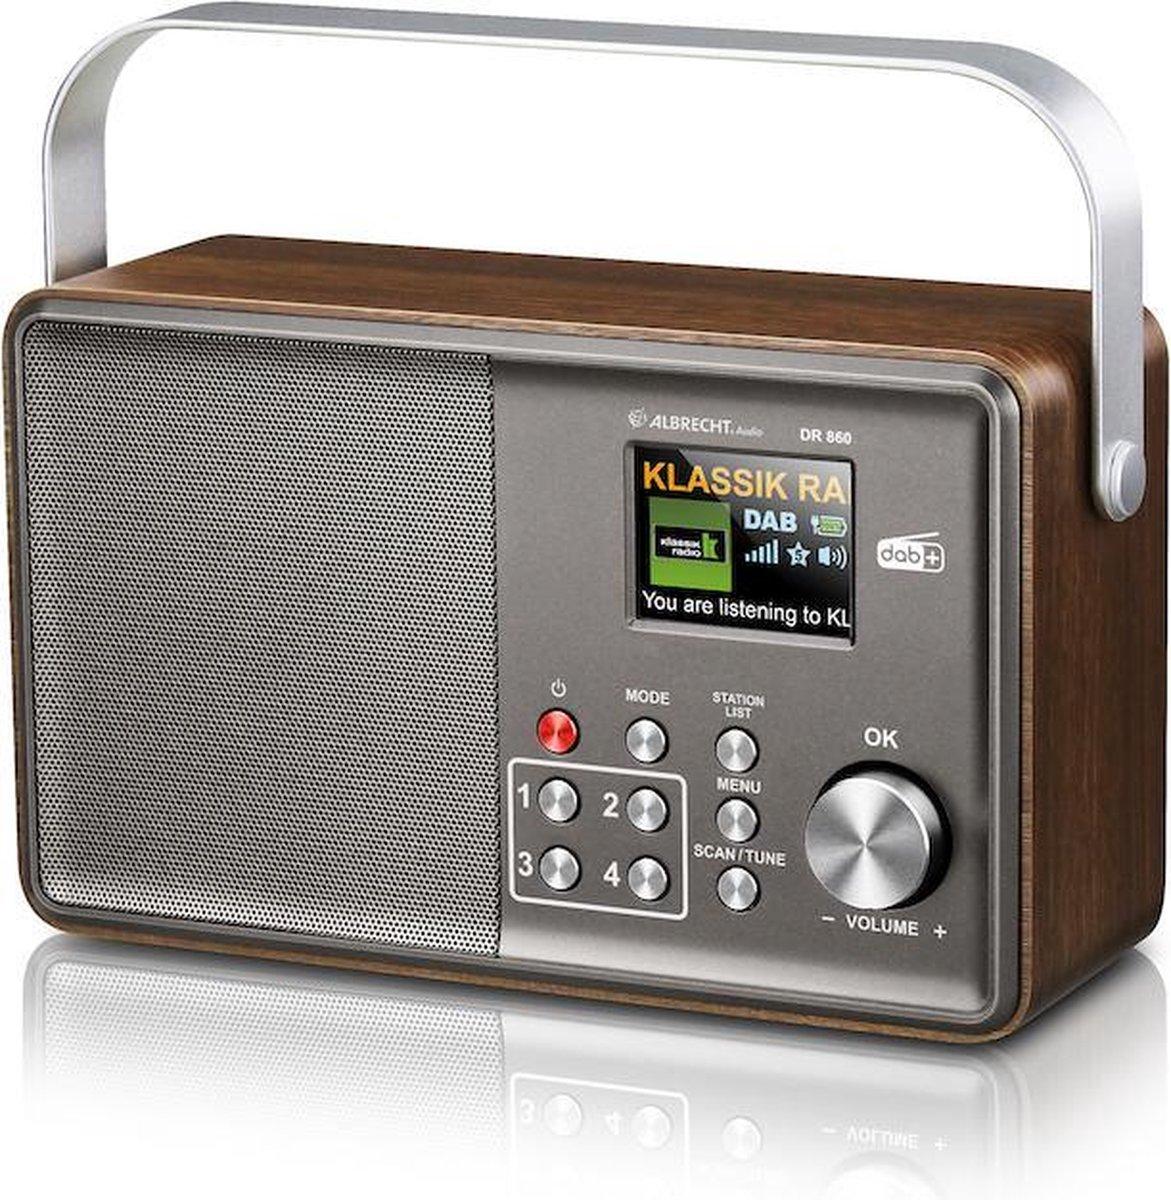 Albrecht DR 860 Senior Digitaleradio,DAB+ en FM radio